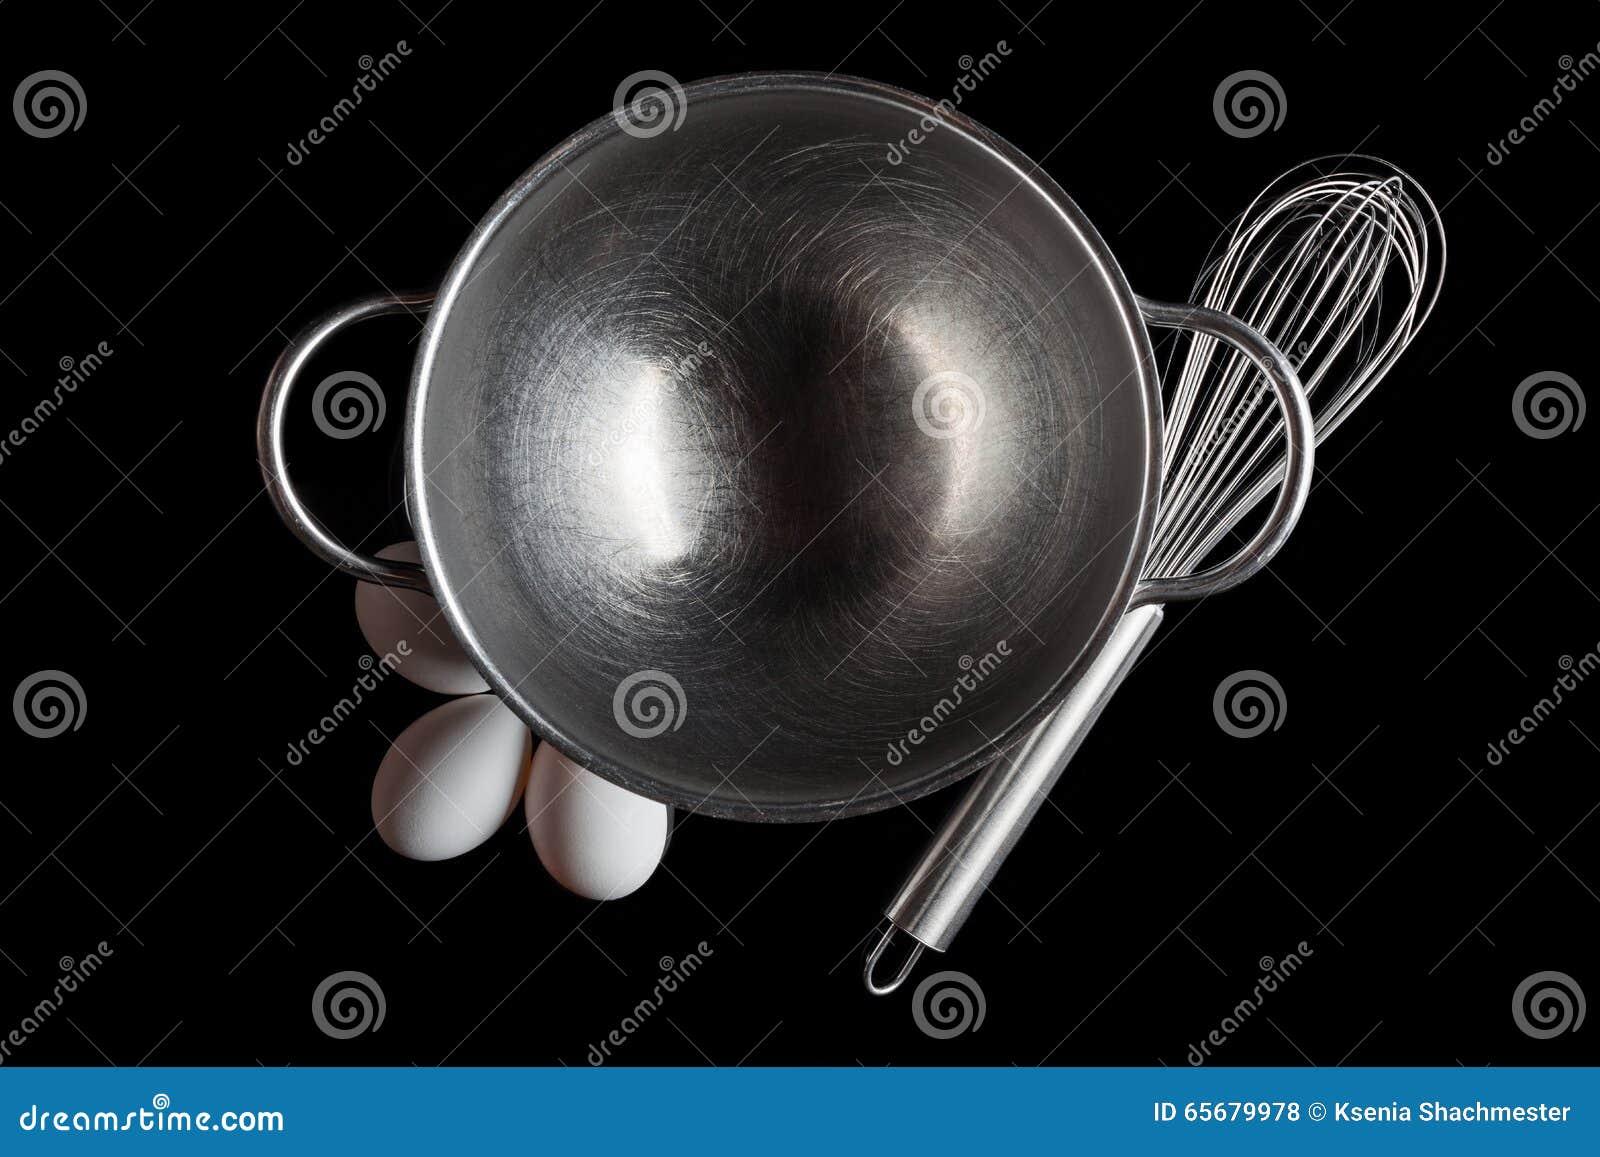 Steel bowl whisker eggs from above on black